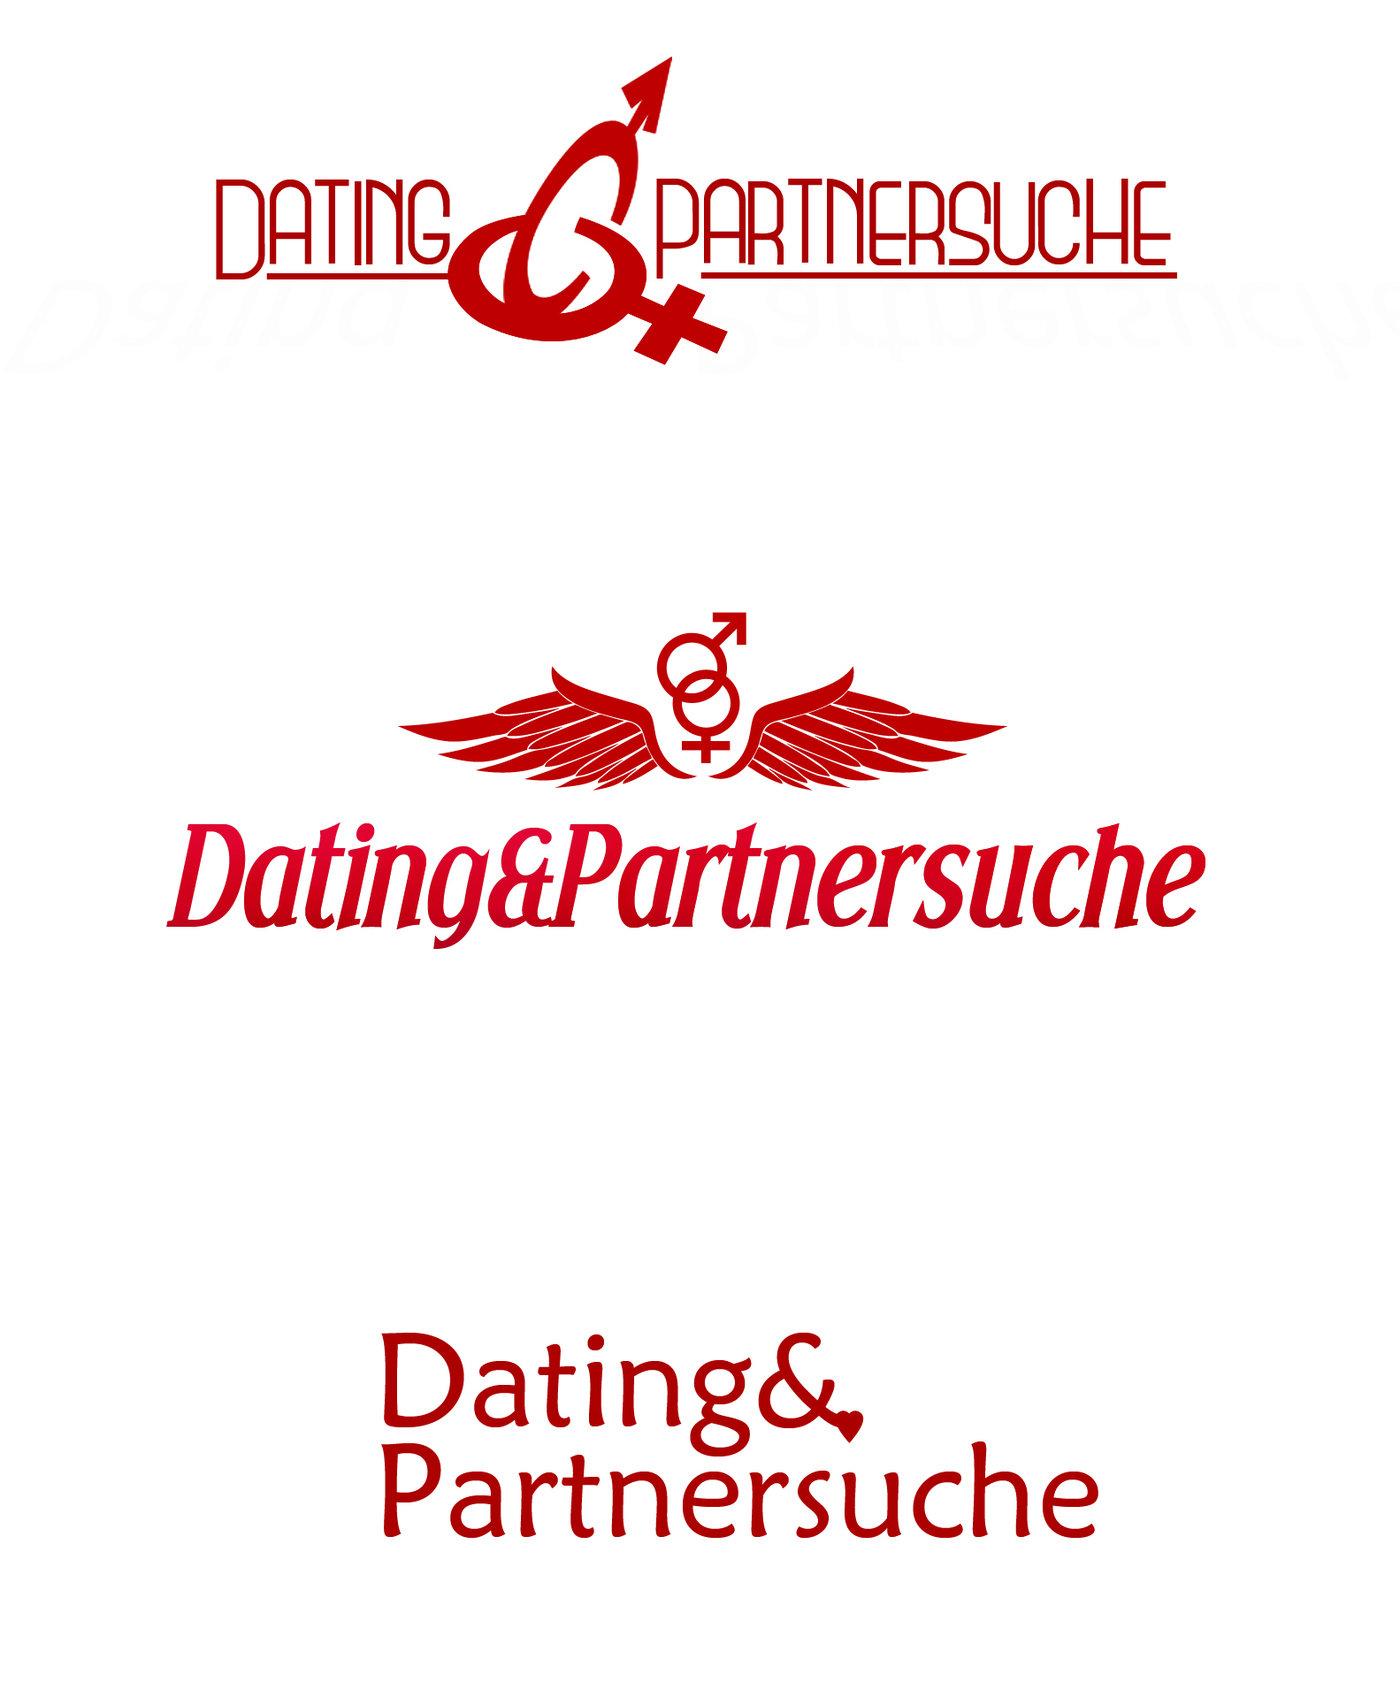 Partnersuche logo